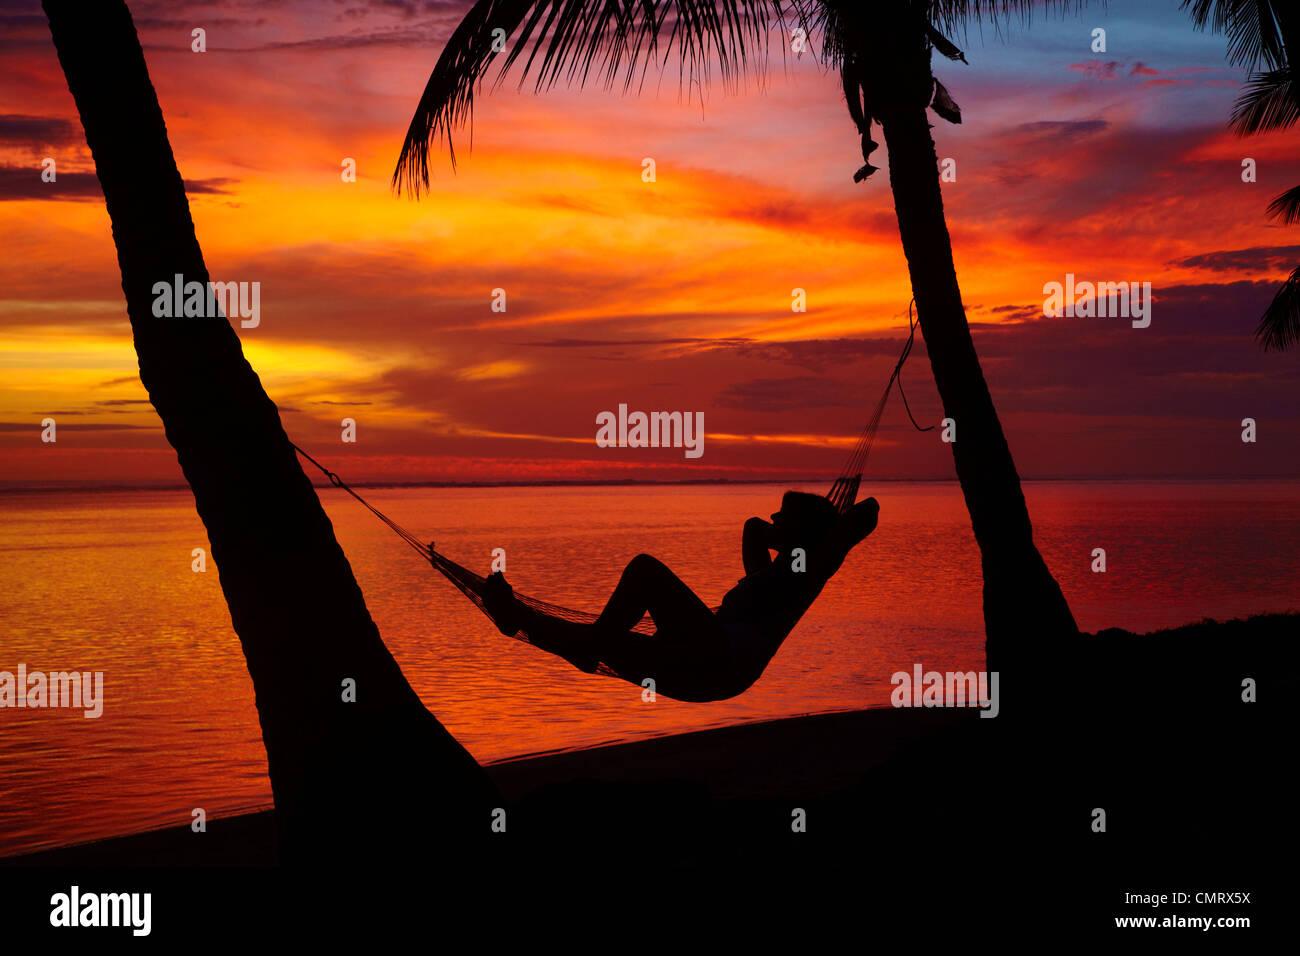 Woman in hammock, and palm trees at sunset, Coral Coast, Viti Levu, Fiji, South Pacific - Stock Image